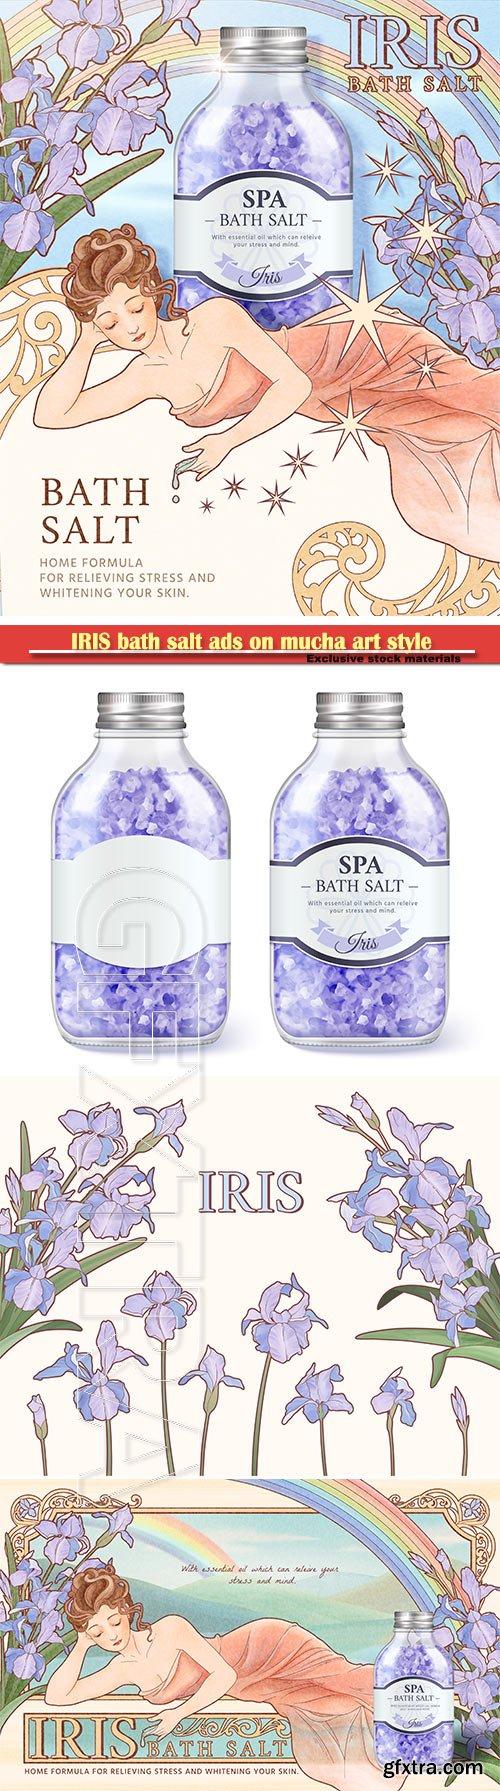 IRIS bath salt ads on mucha art style background, woman side lying with purple flowers